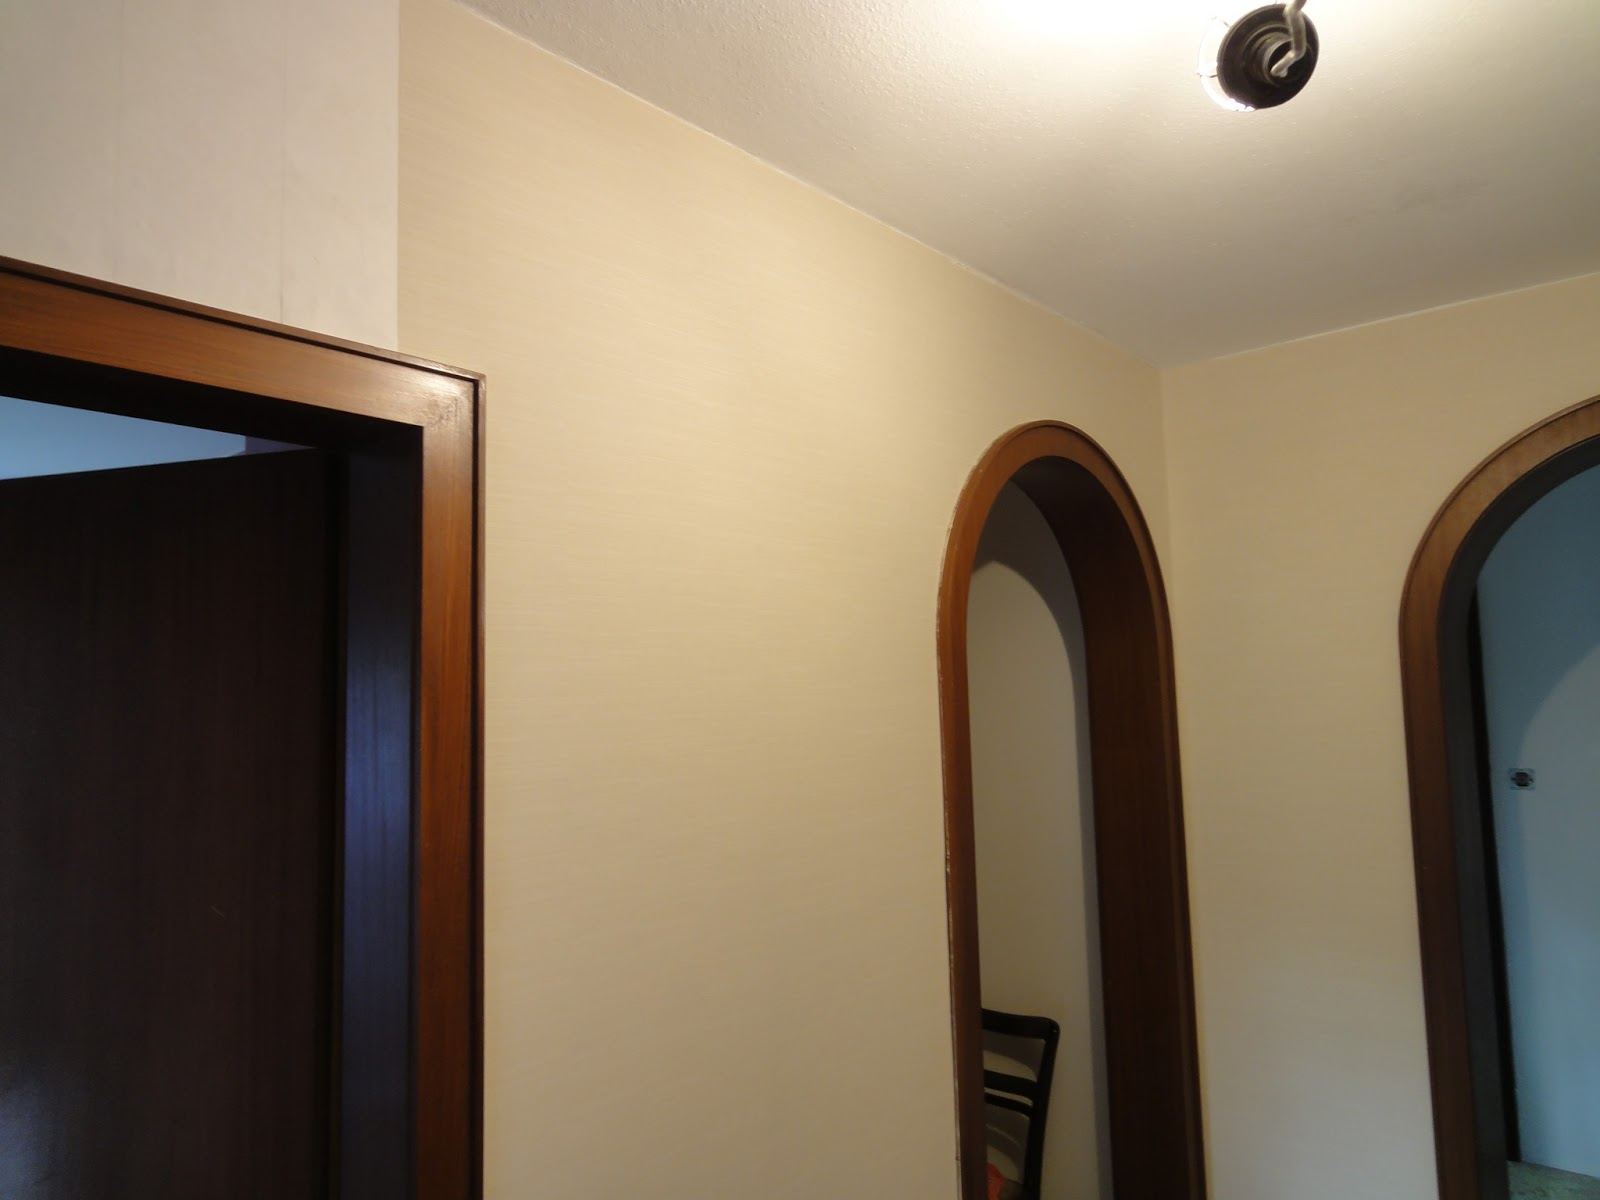 vliestapete tapezieren. Black Bedroom Furniture Sets. Home Design Ideas